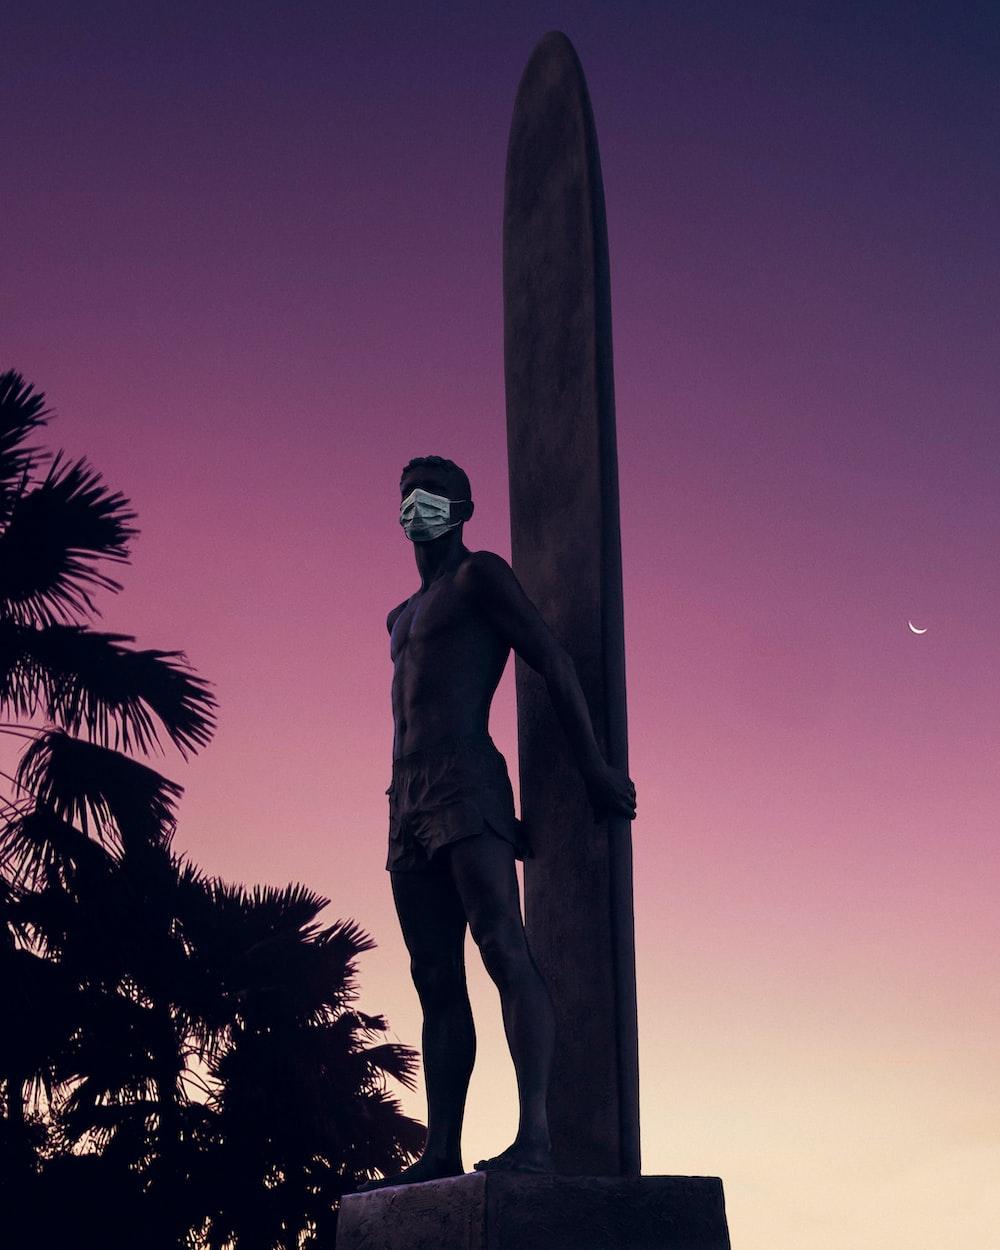 man in black pants statue